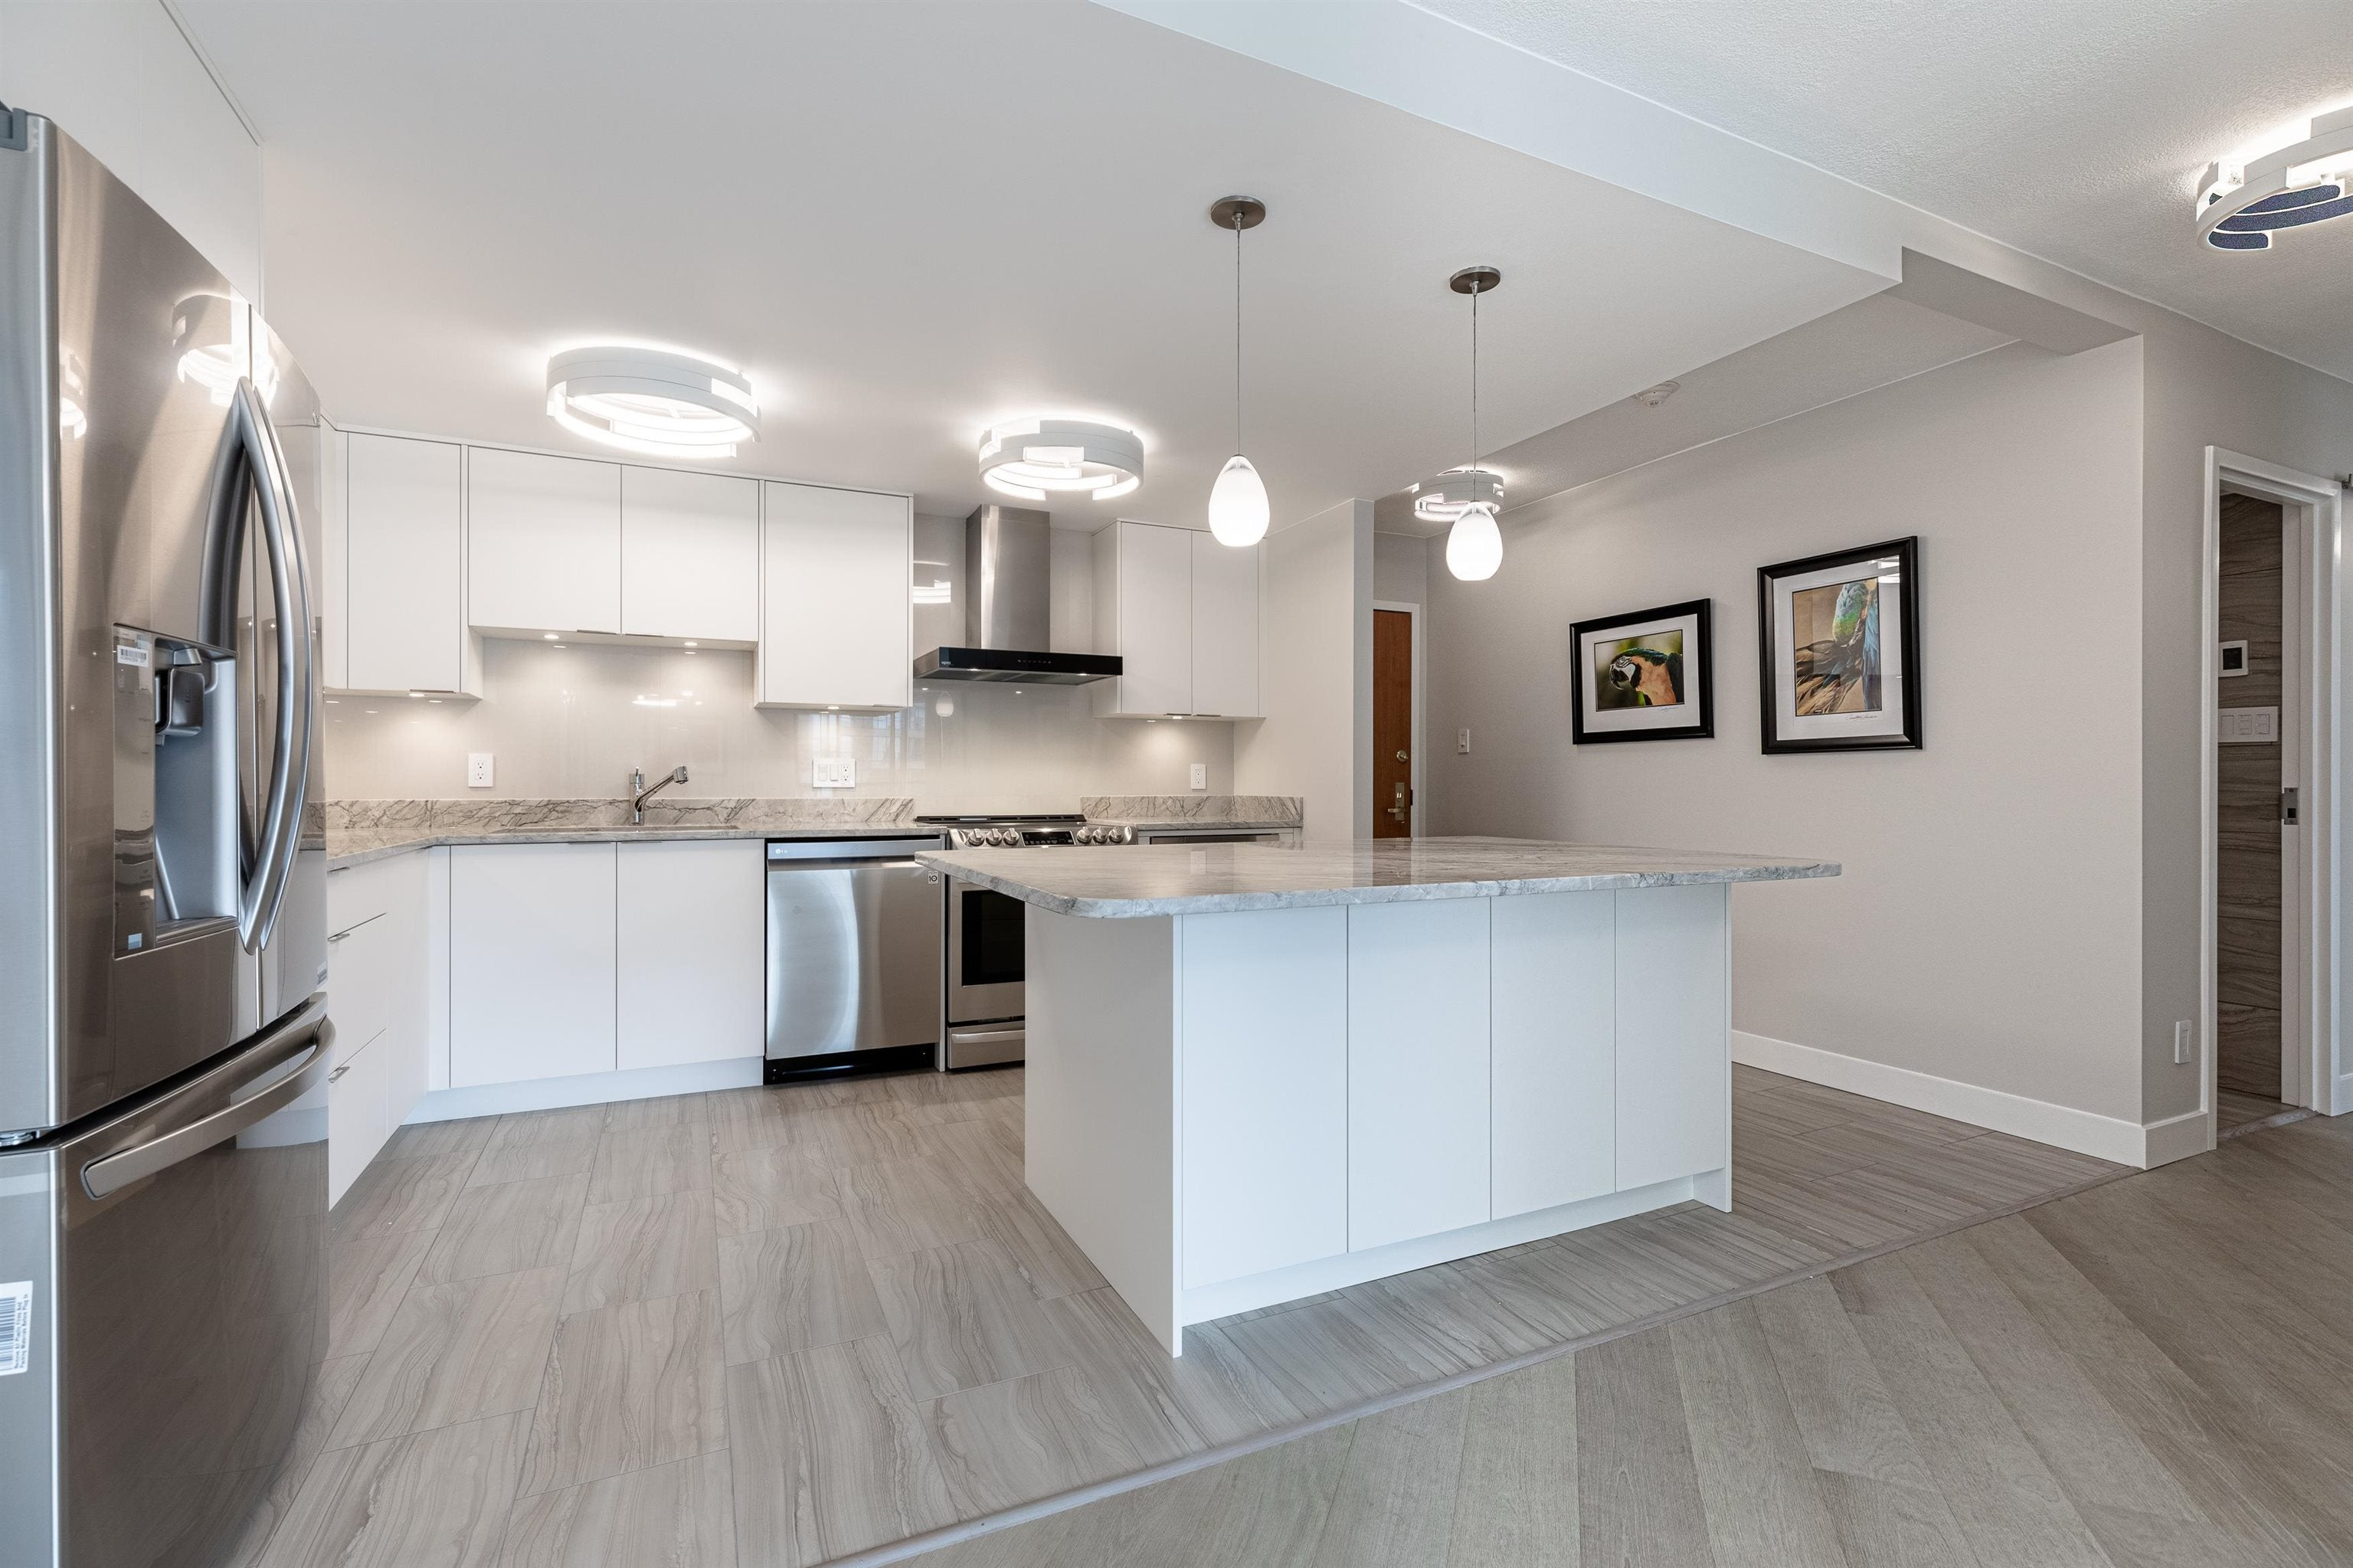 406 1450 PENNYFARTHING DRIVE - False Creek Apartment/Condo for sale, 2 Bedrooms (R2617259) - #10